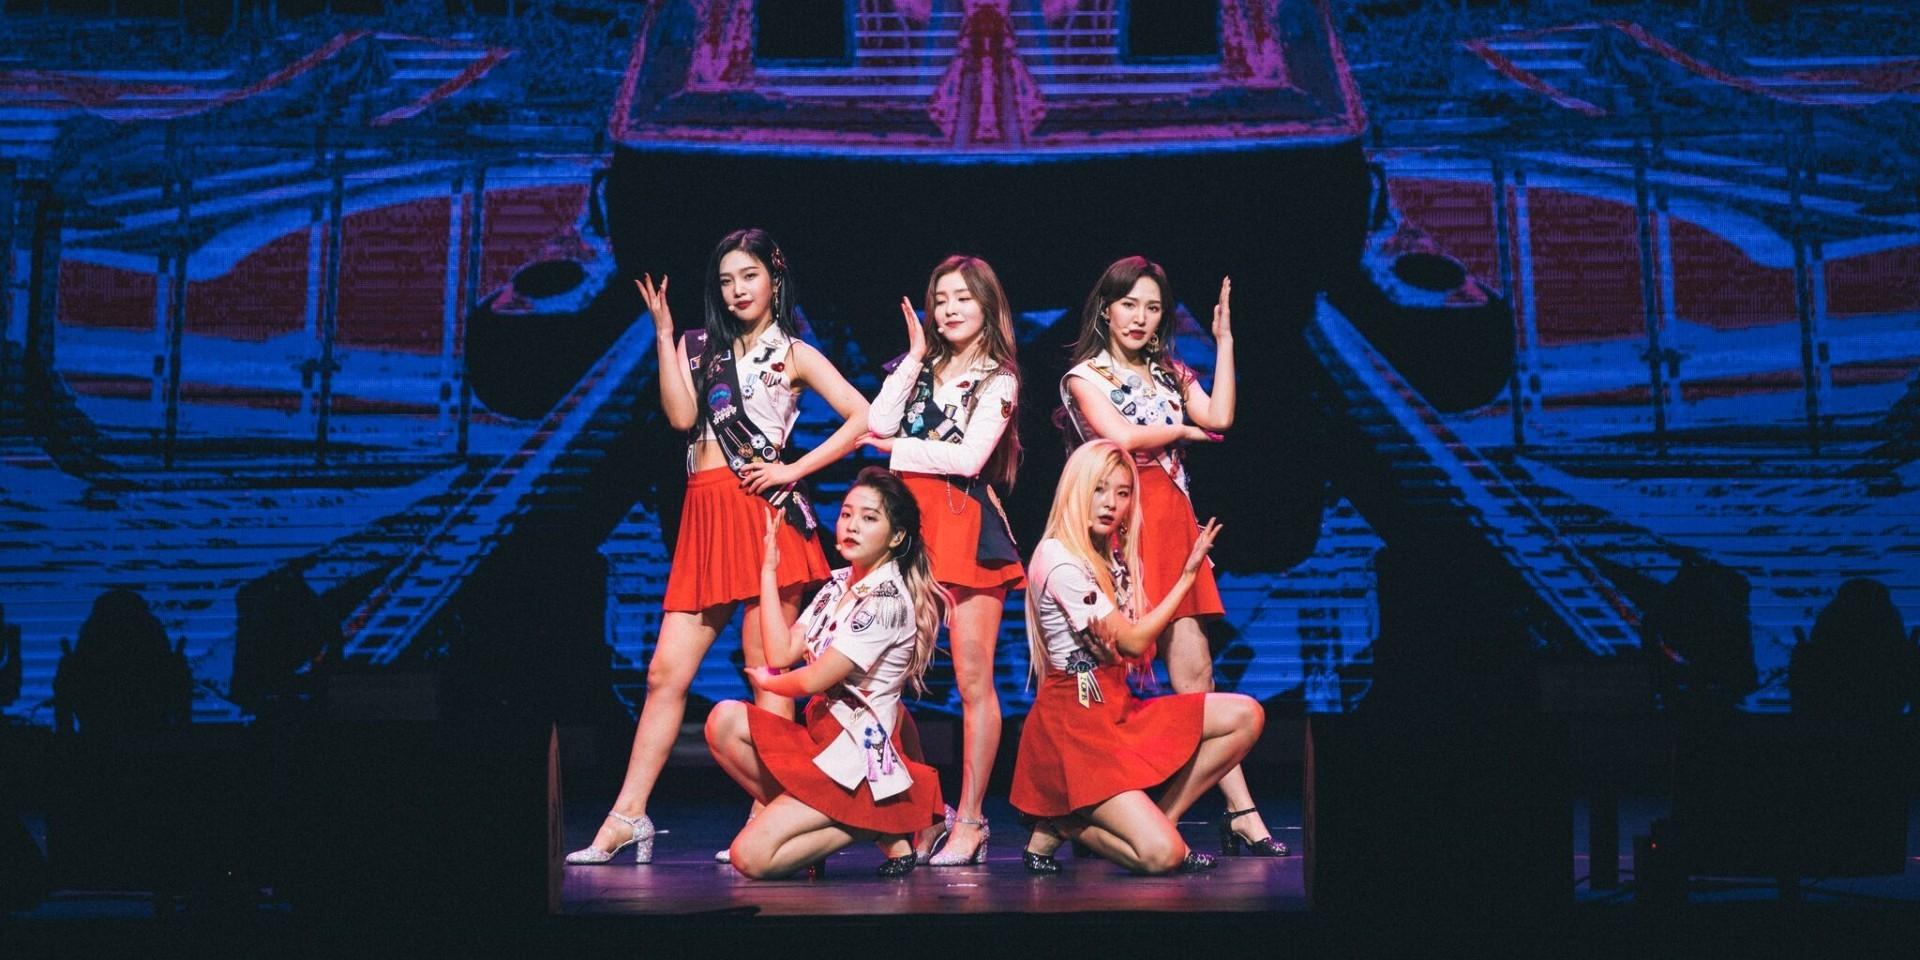 Red Velvet dazzles despite member's injury in Singapore stop of REDMARE tour – gig report